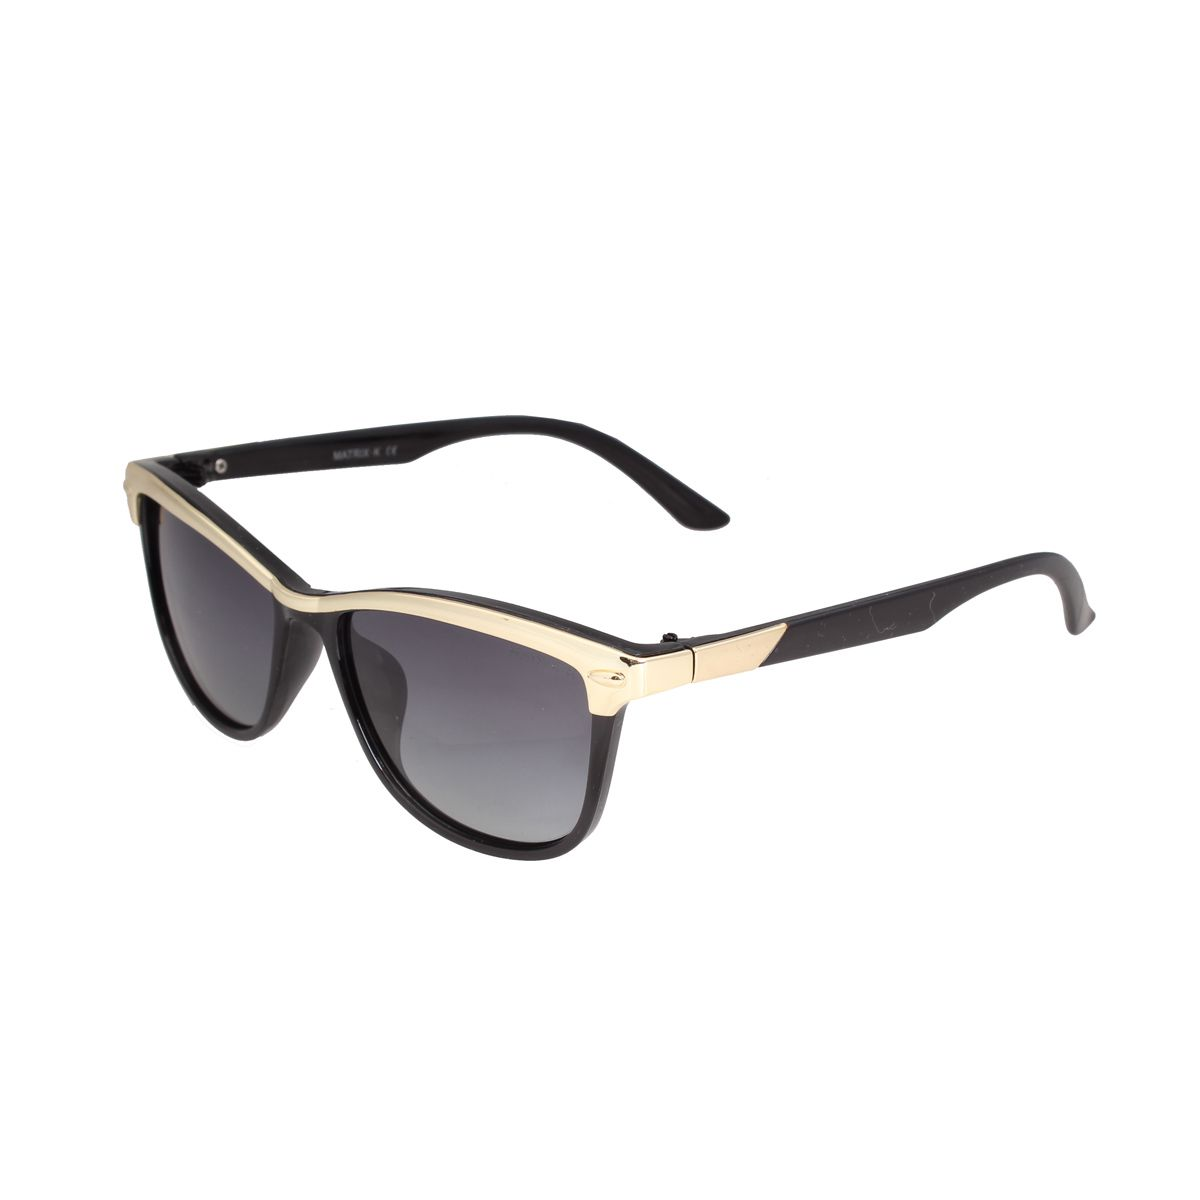 عینک آفتابی زنانه کد 5522